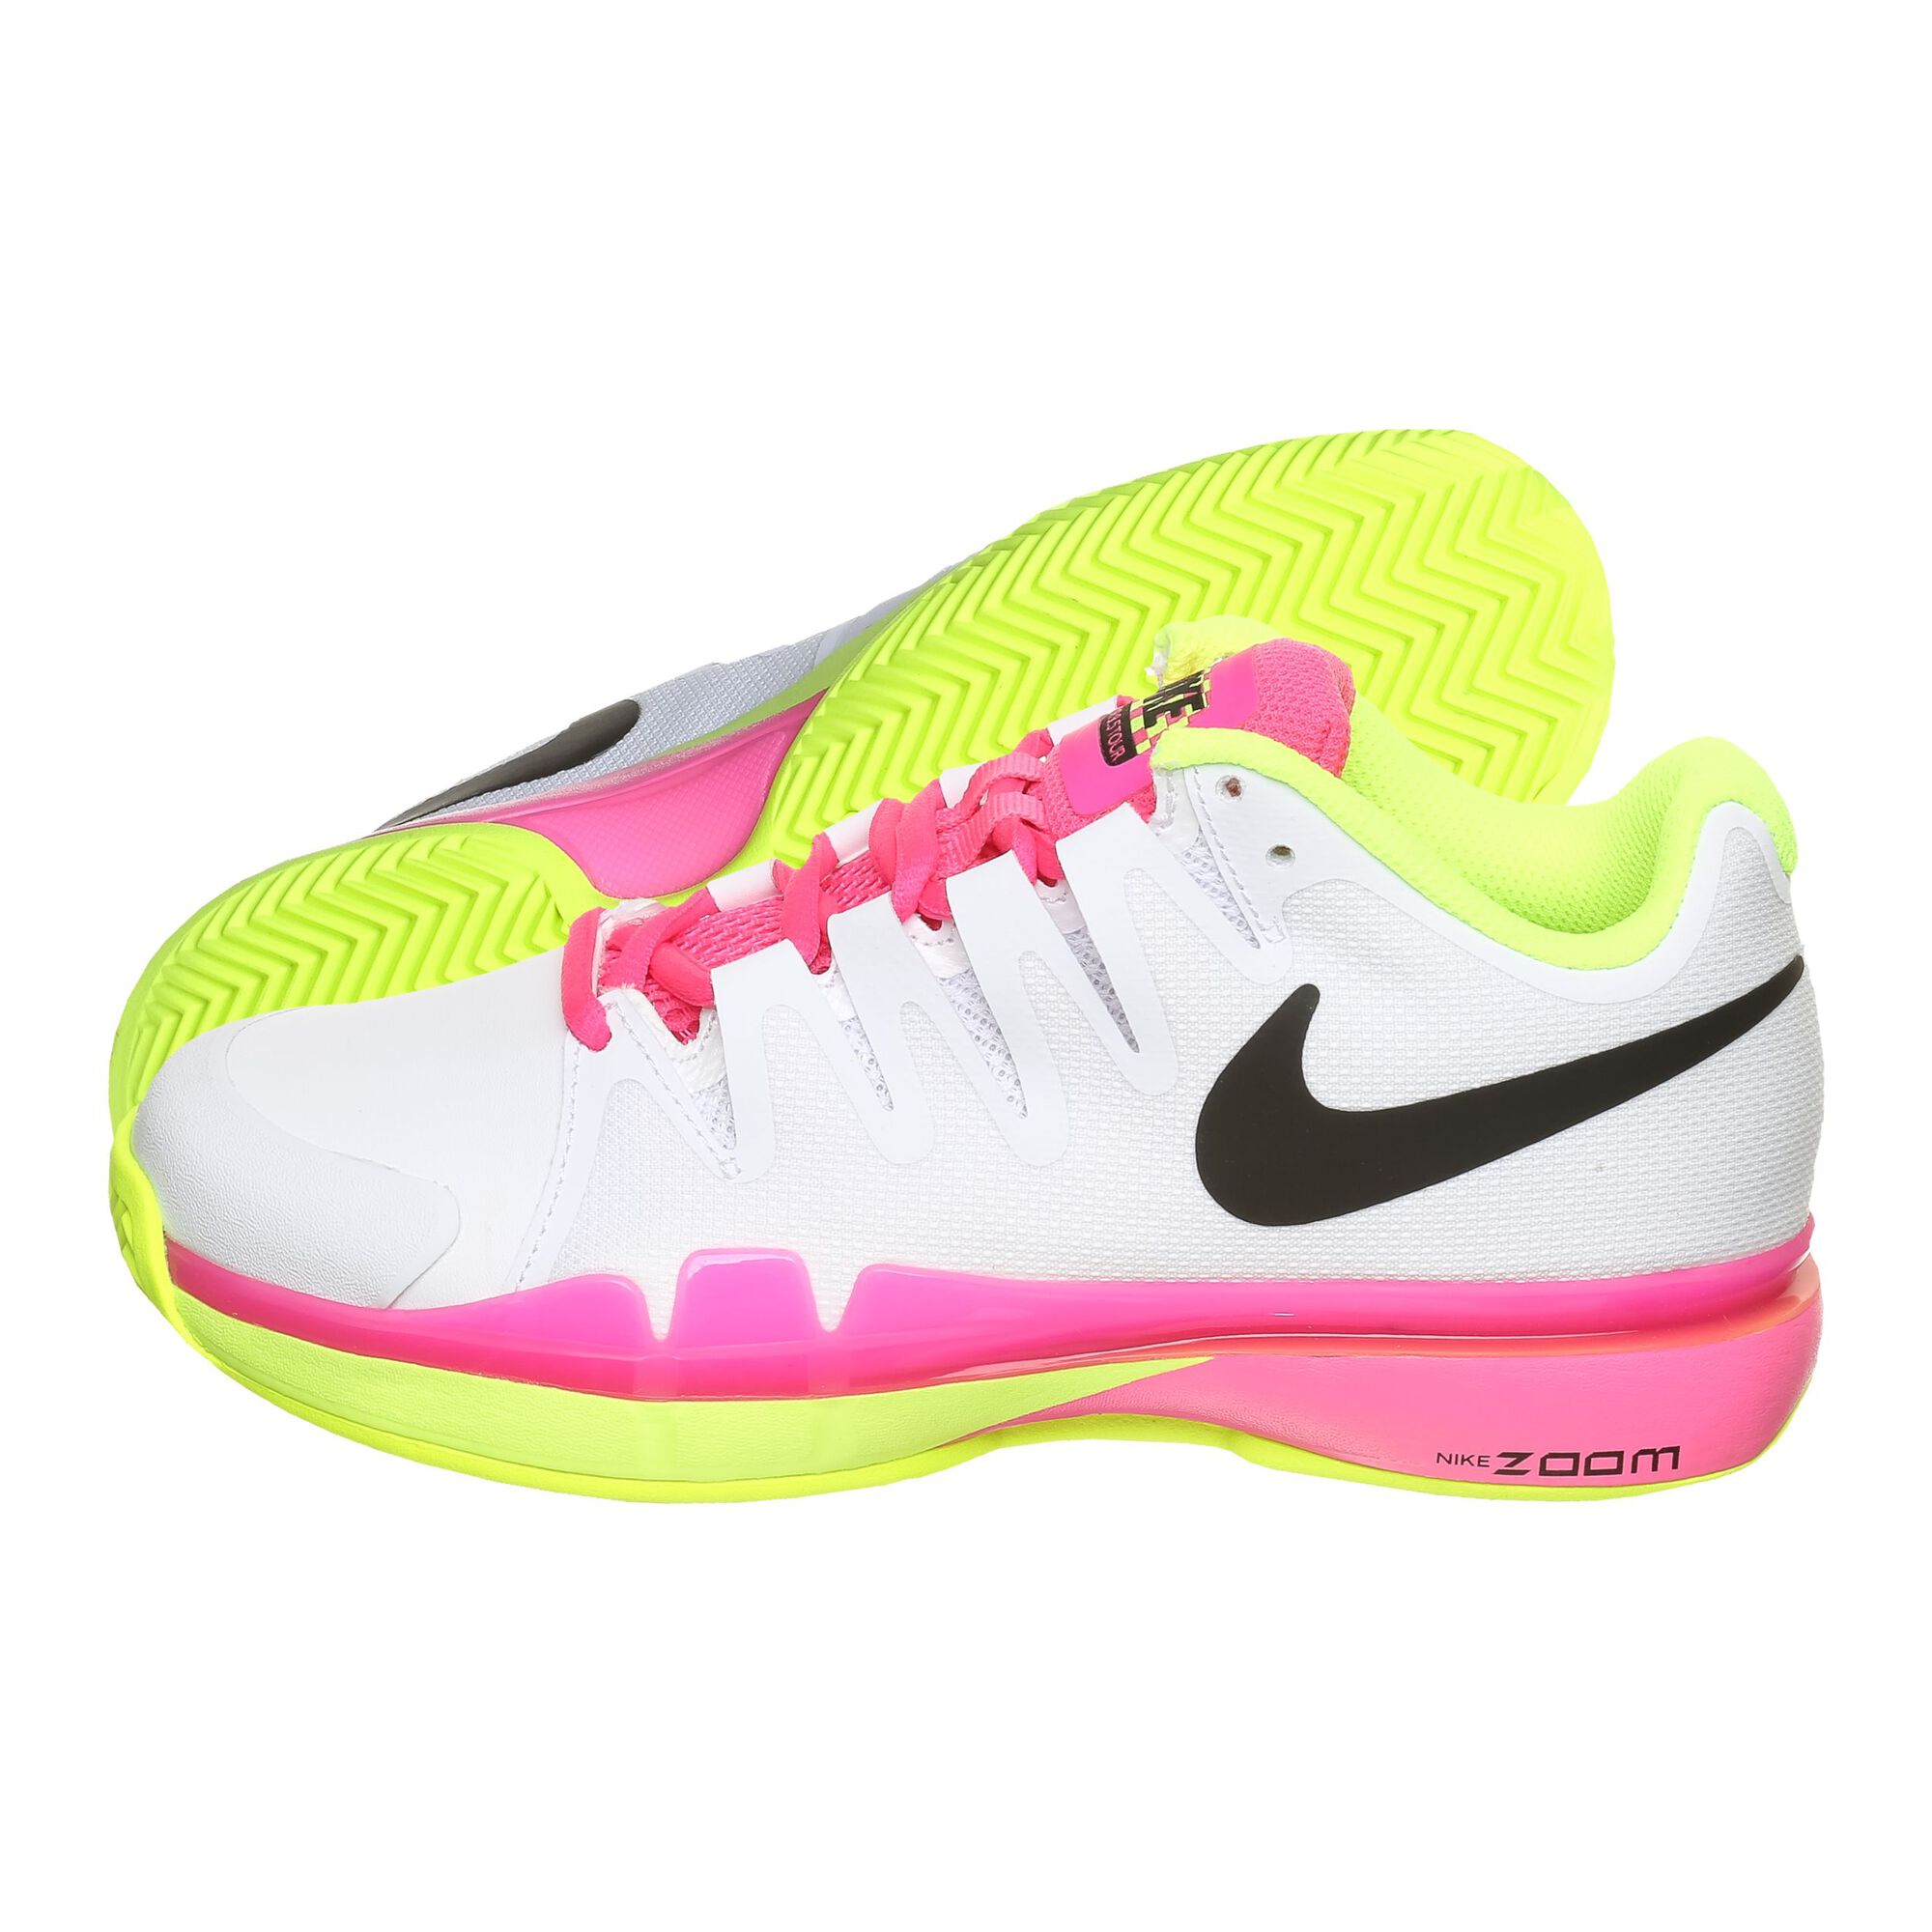 4104ac7c4010 Nike Zoom Vapor 9.5 Tour Clay Sandplatzschuh Damen - Weiß